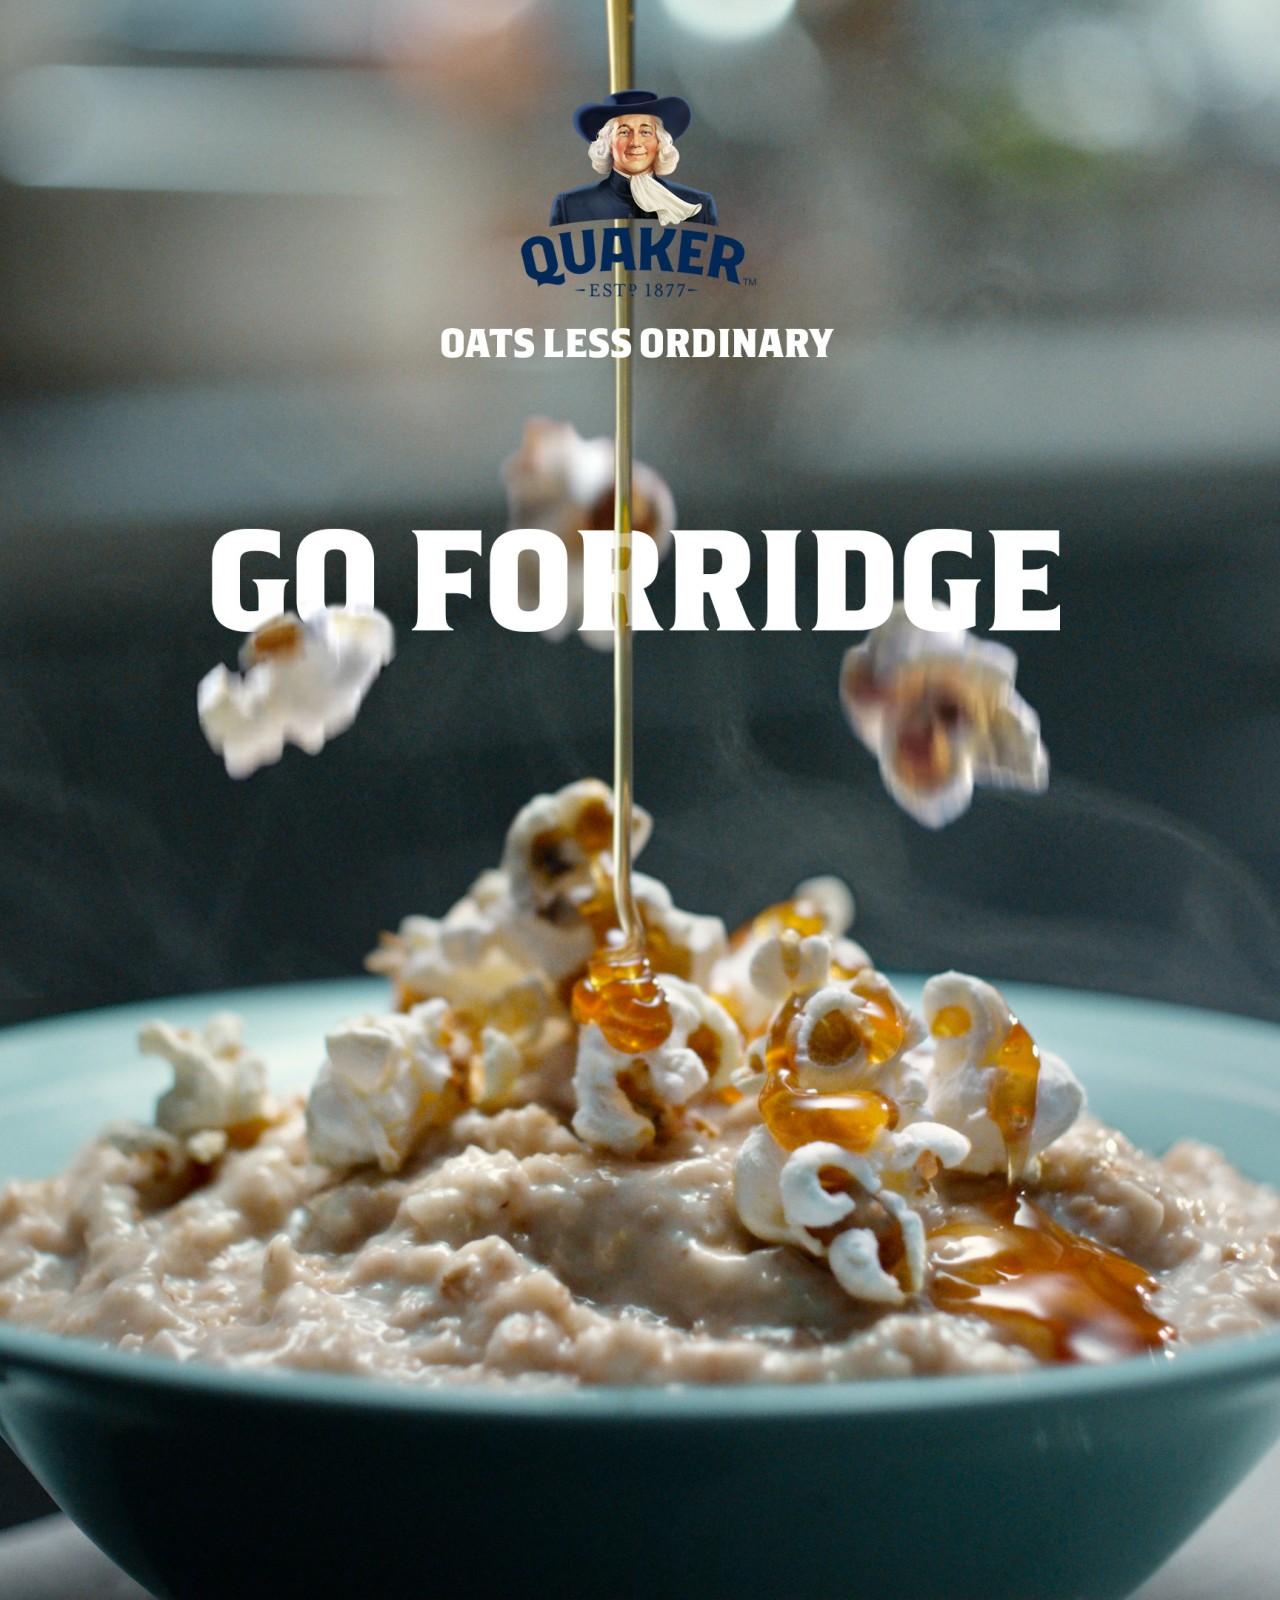 Quaker Oats: Go Forridge by AMV BBDO   Creative Works   The Drum